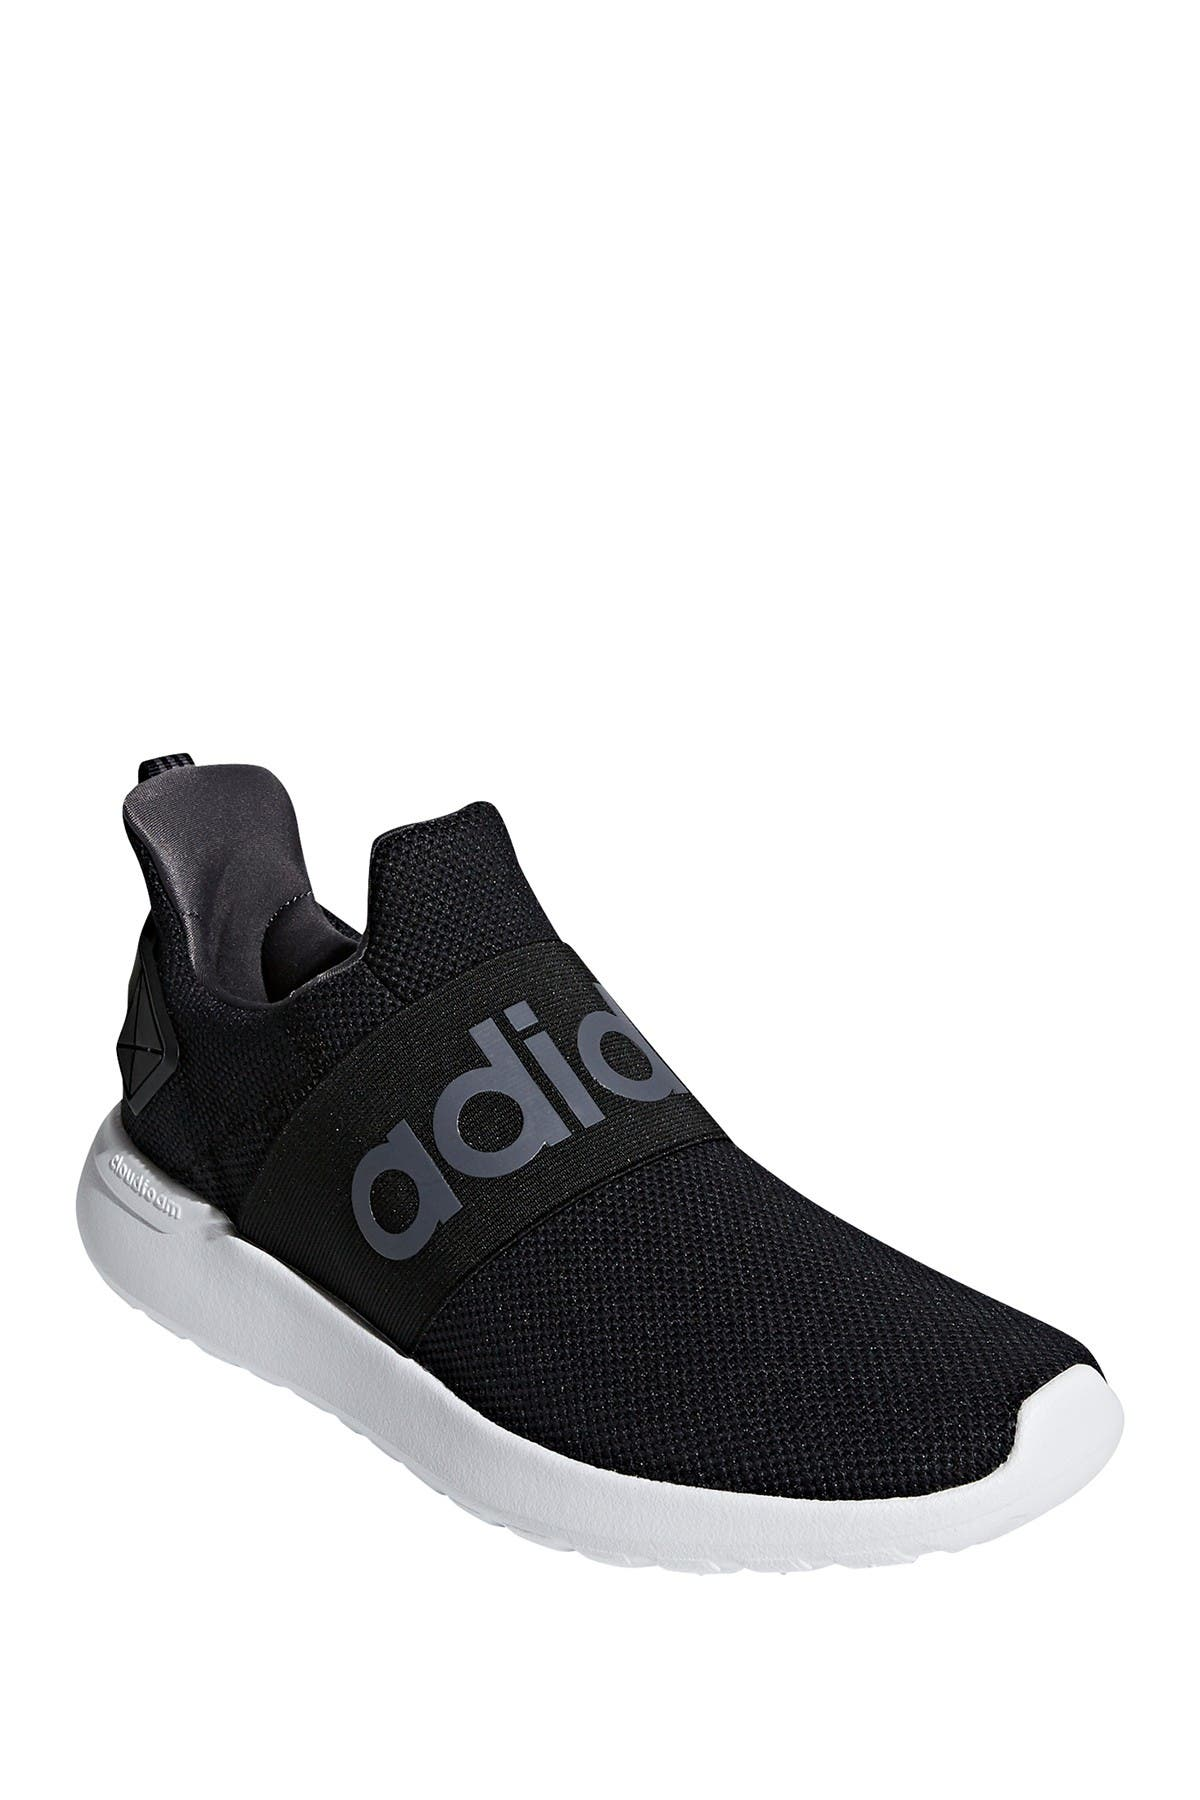 Image of adidas Lite Racer Adapt Sneaker